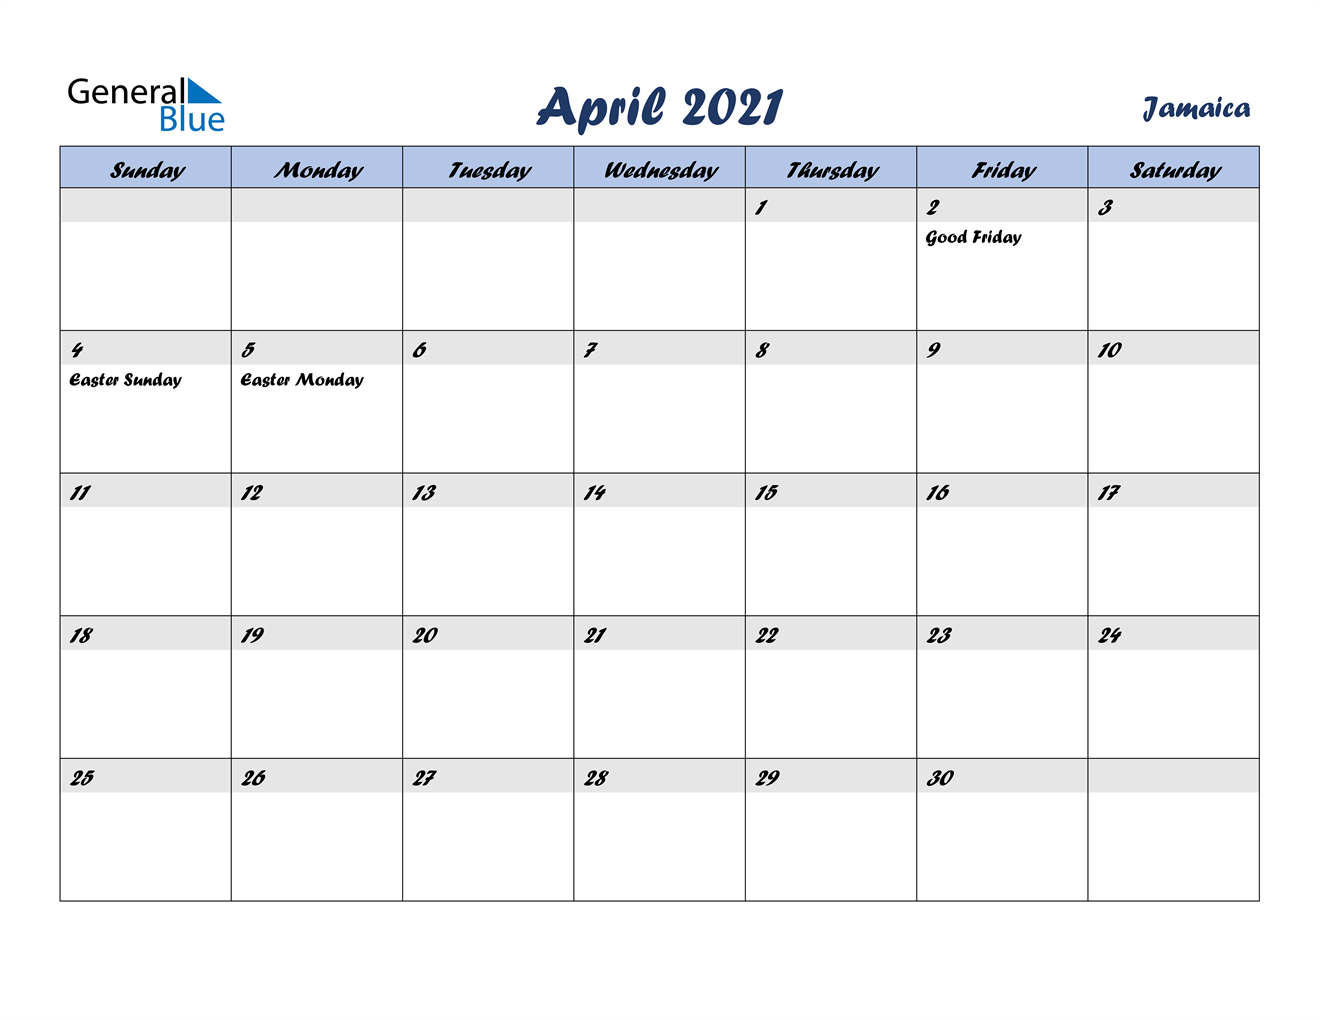 April 2021 Calendar Jamaica